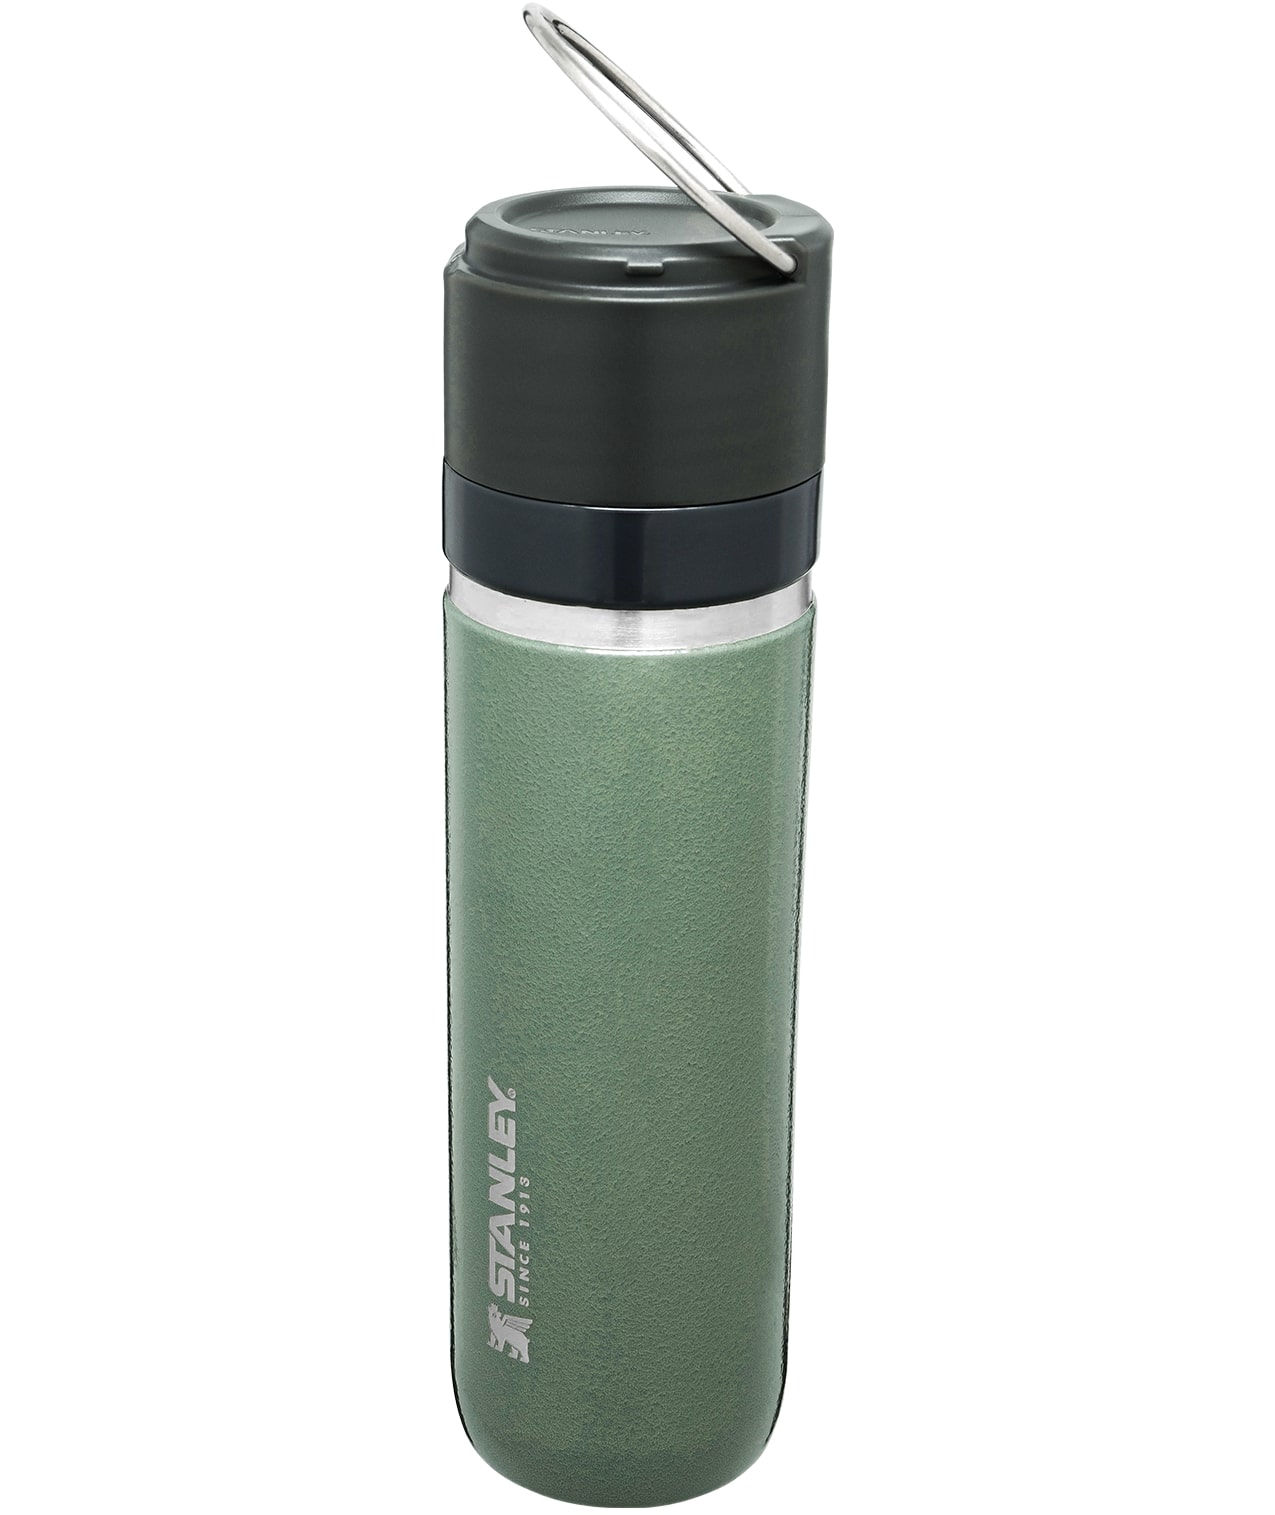 Bình giữ nhiệt Stanley Ceramivac GO Bottle 24oz – Green